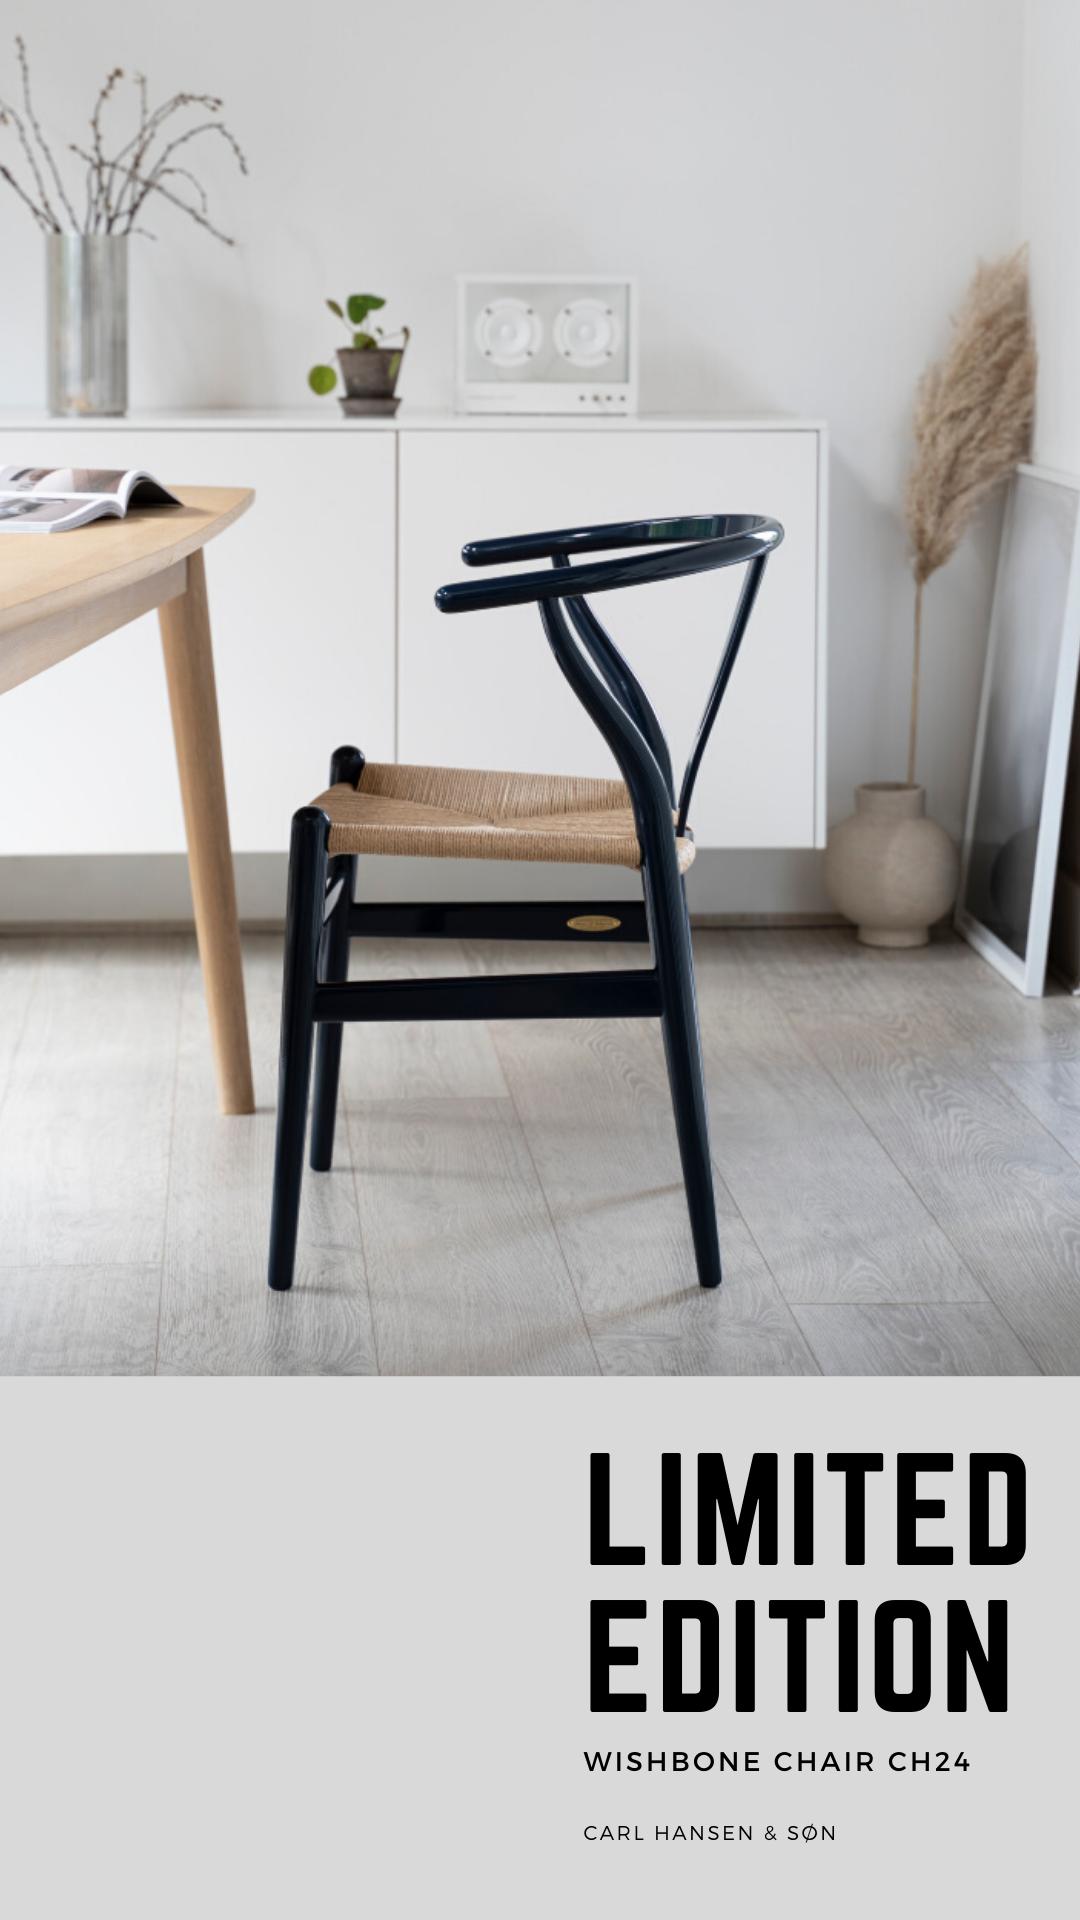 AD | Wishbone chair, Chair, Scandinavian interior design